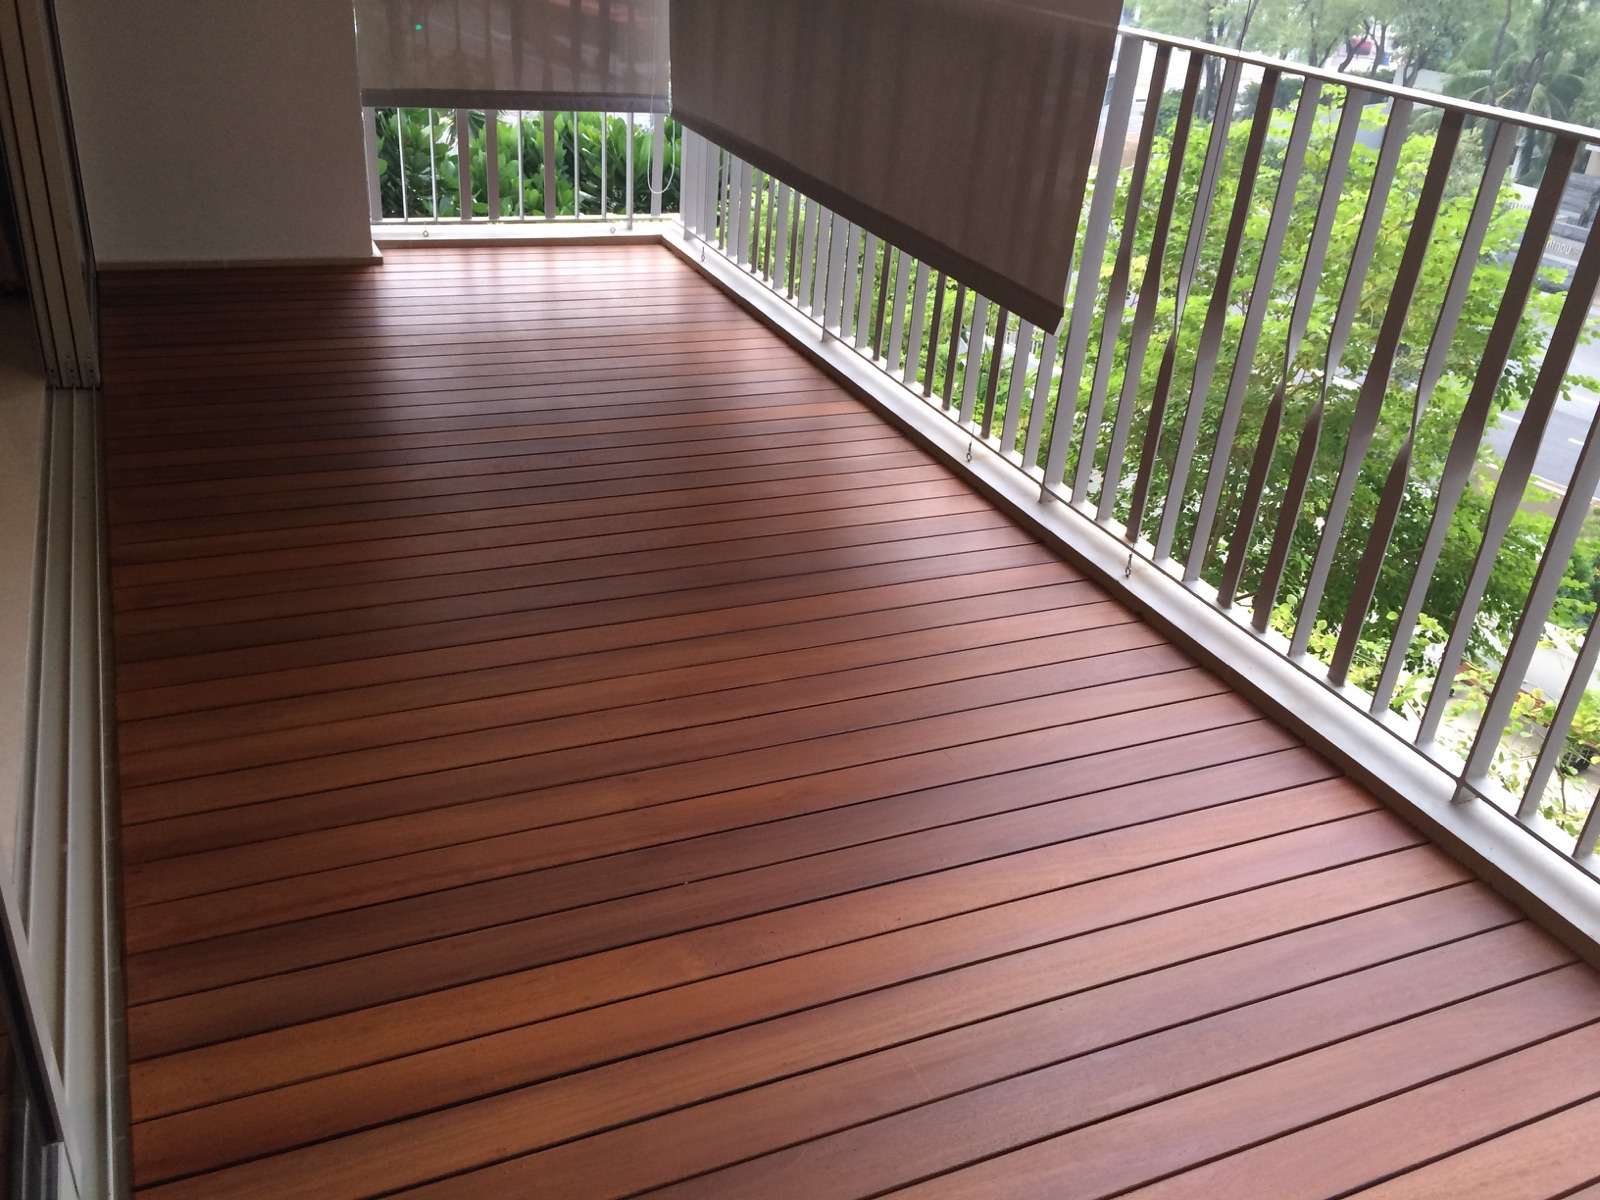 Should I Use Wood Or Composite Decking Decks Ideas